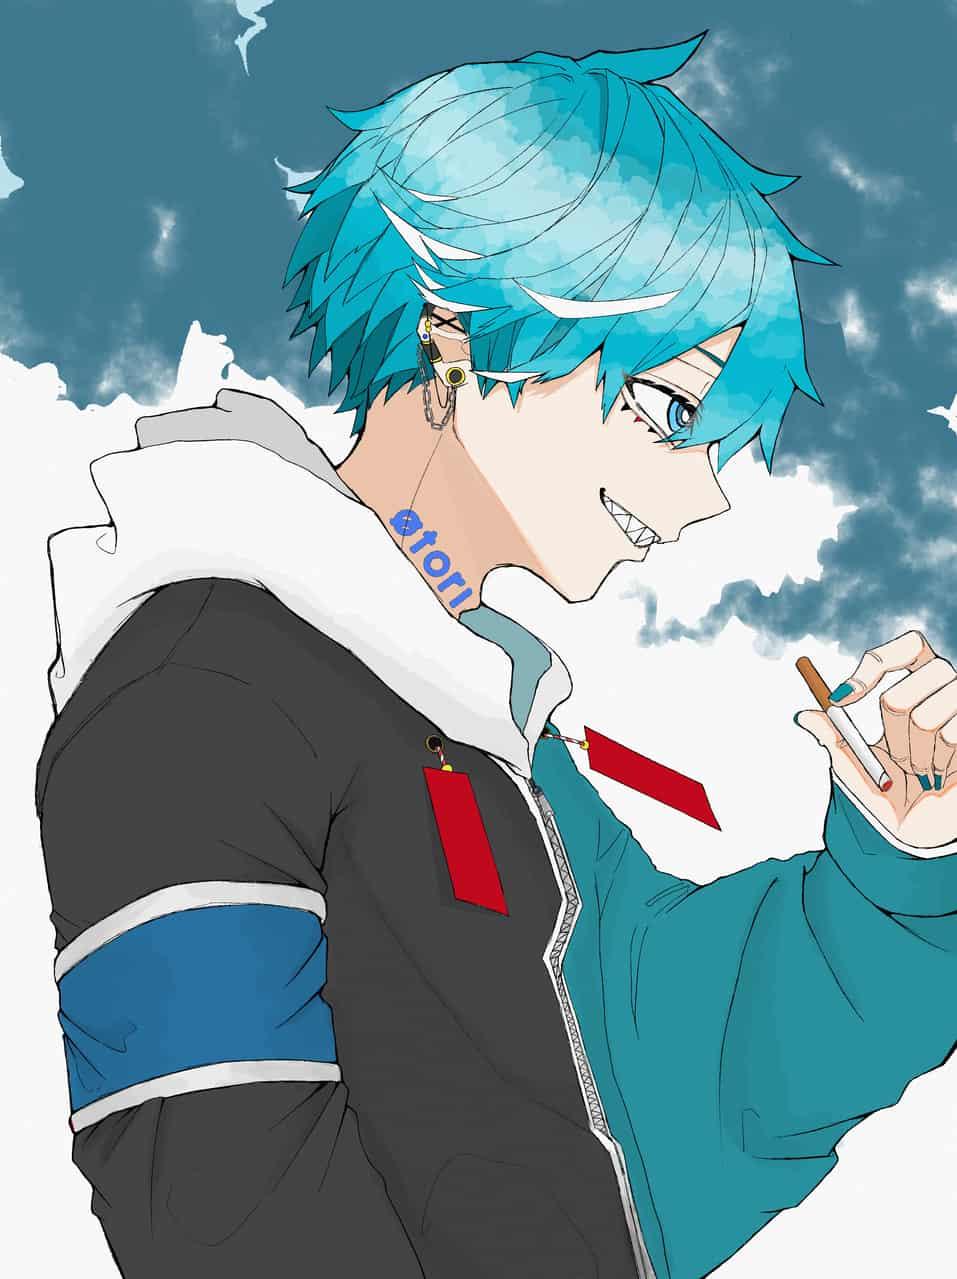 Brat Illust of をとり art blue oc medibangpaint illustration boy